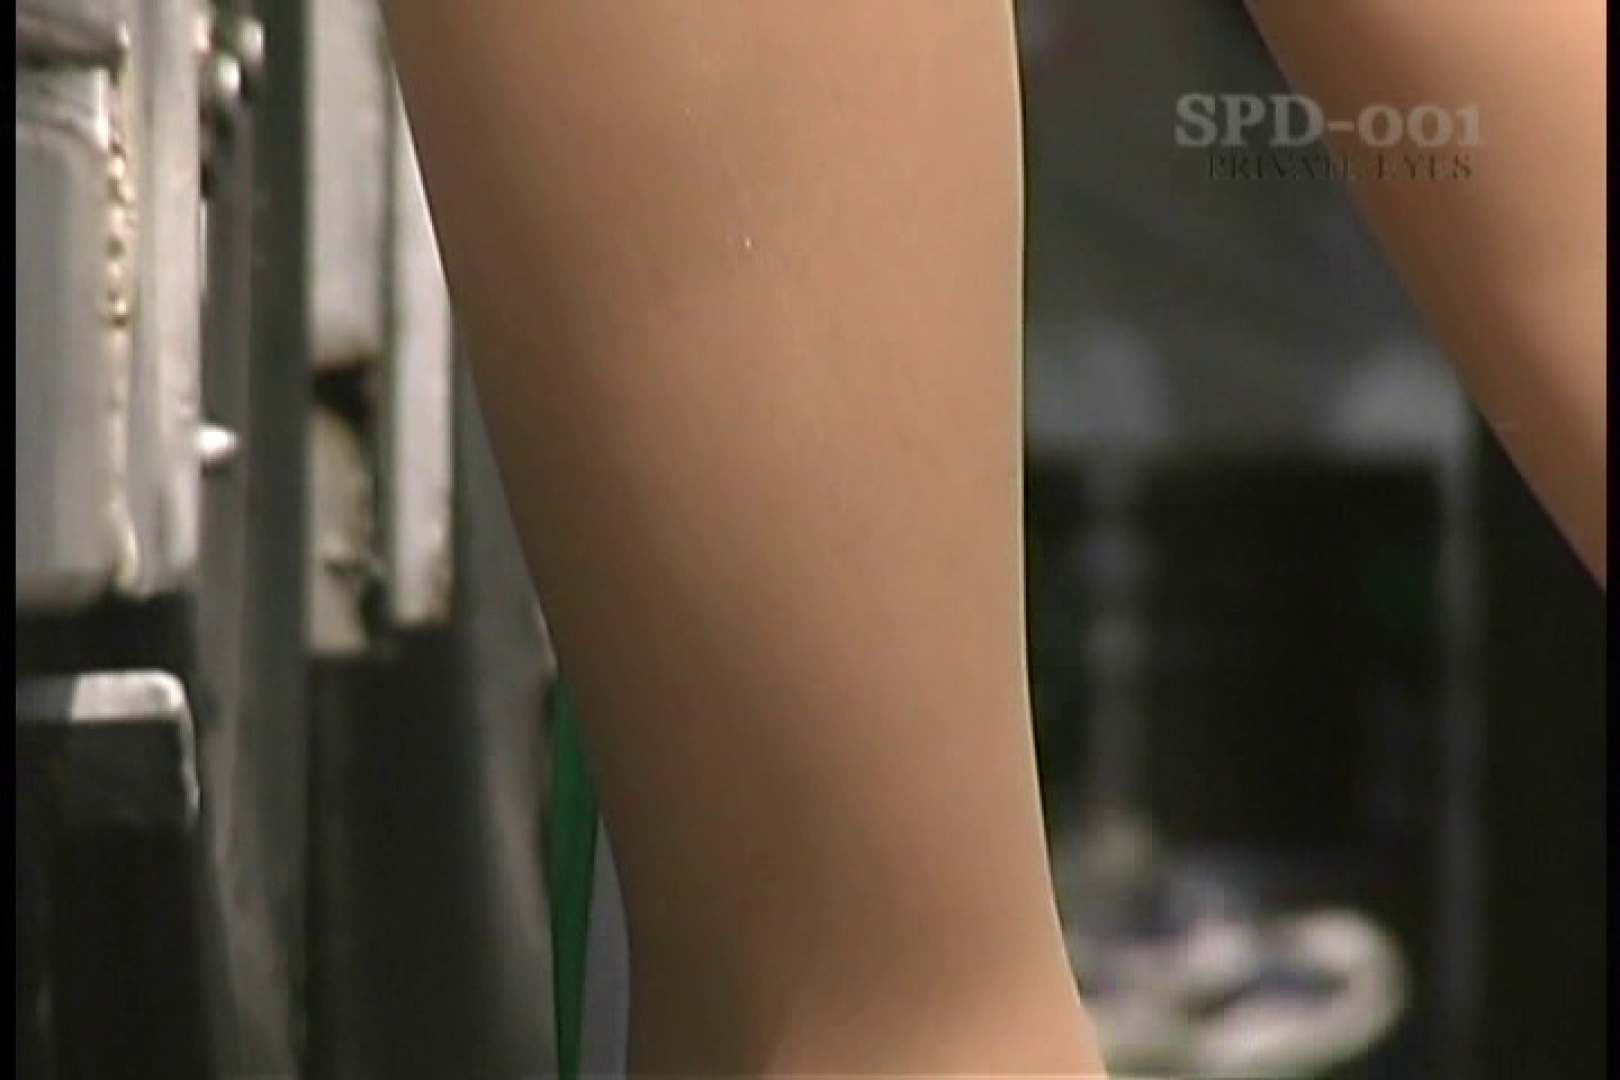 高画質版!SPD-001 サーキットの女神達 Vol.00 名作映像 | 高画質  109PIX 46